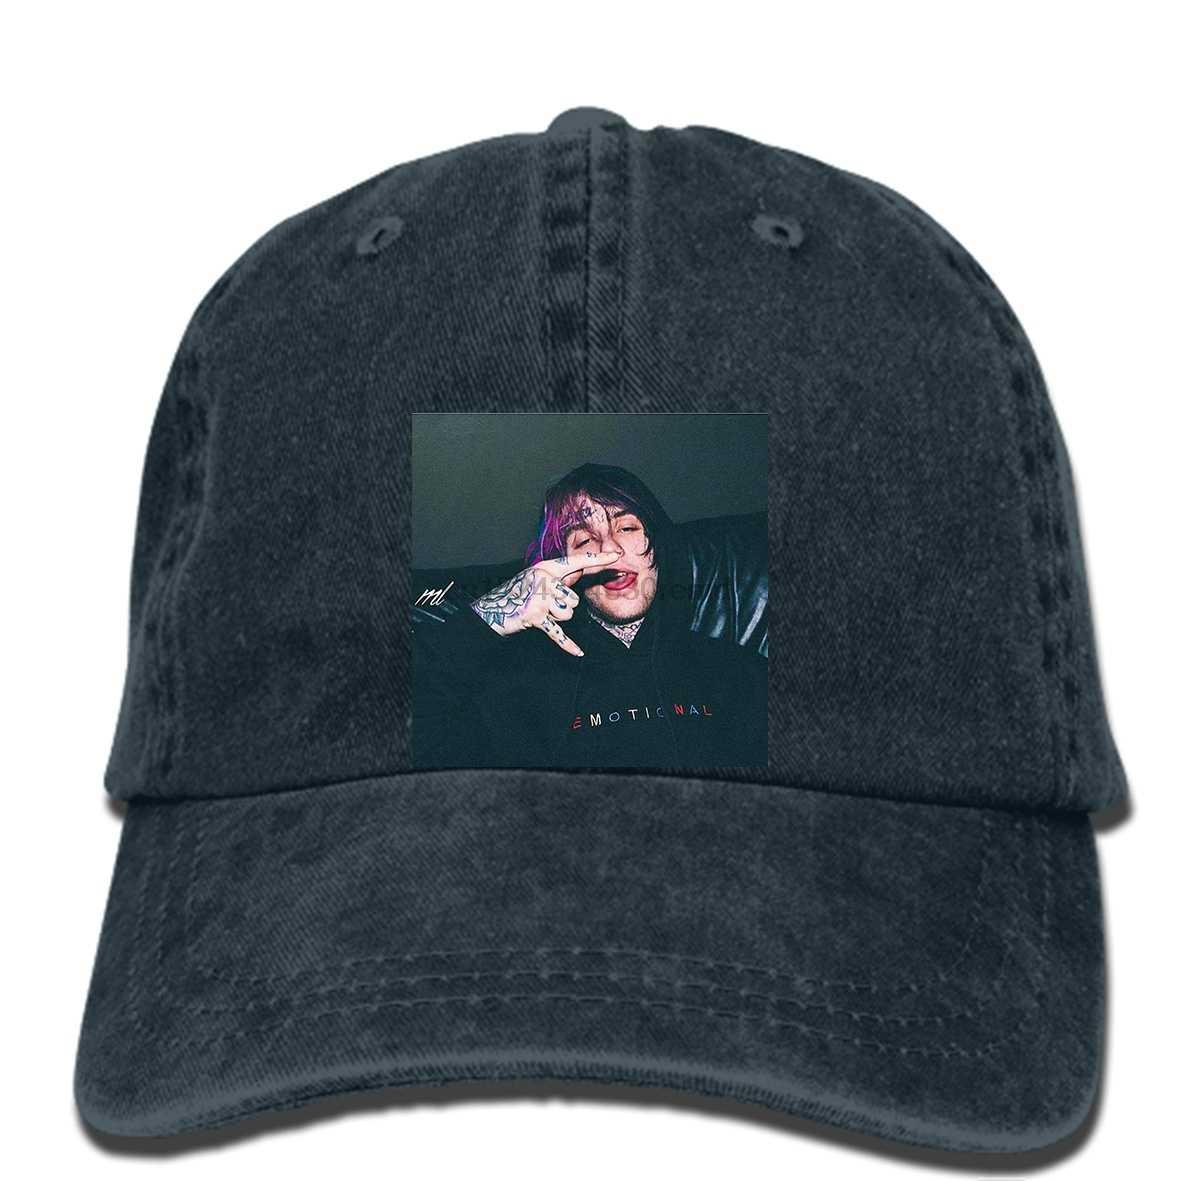 b49fd38011f hip hop Baseball caps Lil Peep Men  caps s hat Gift More and Colors New  Brand